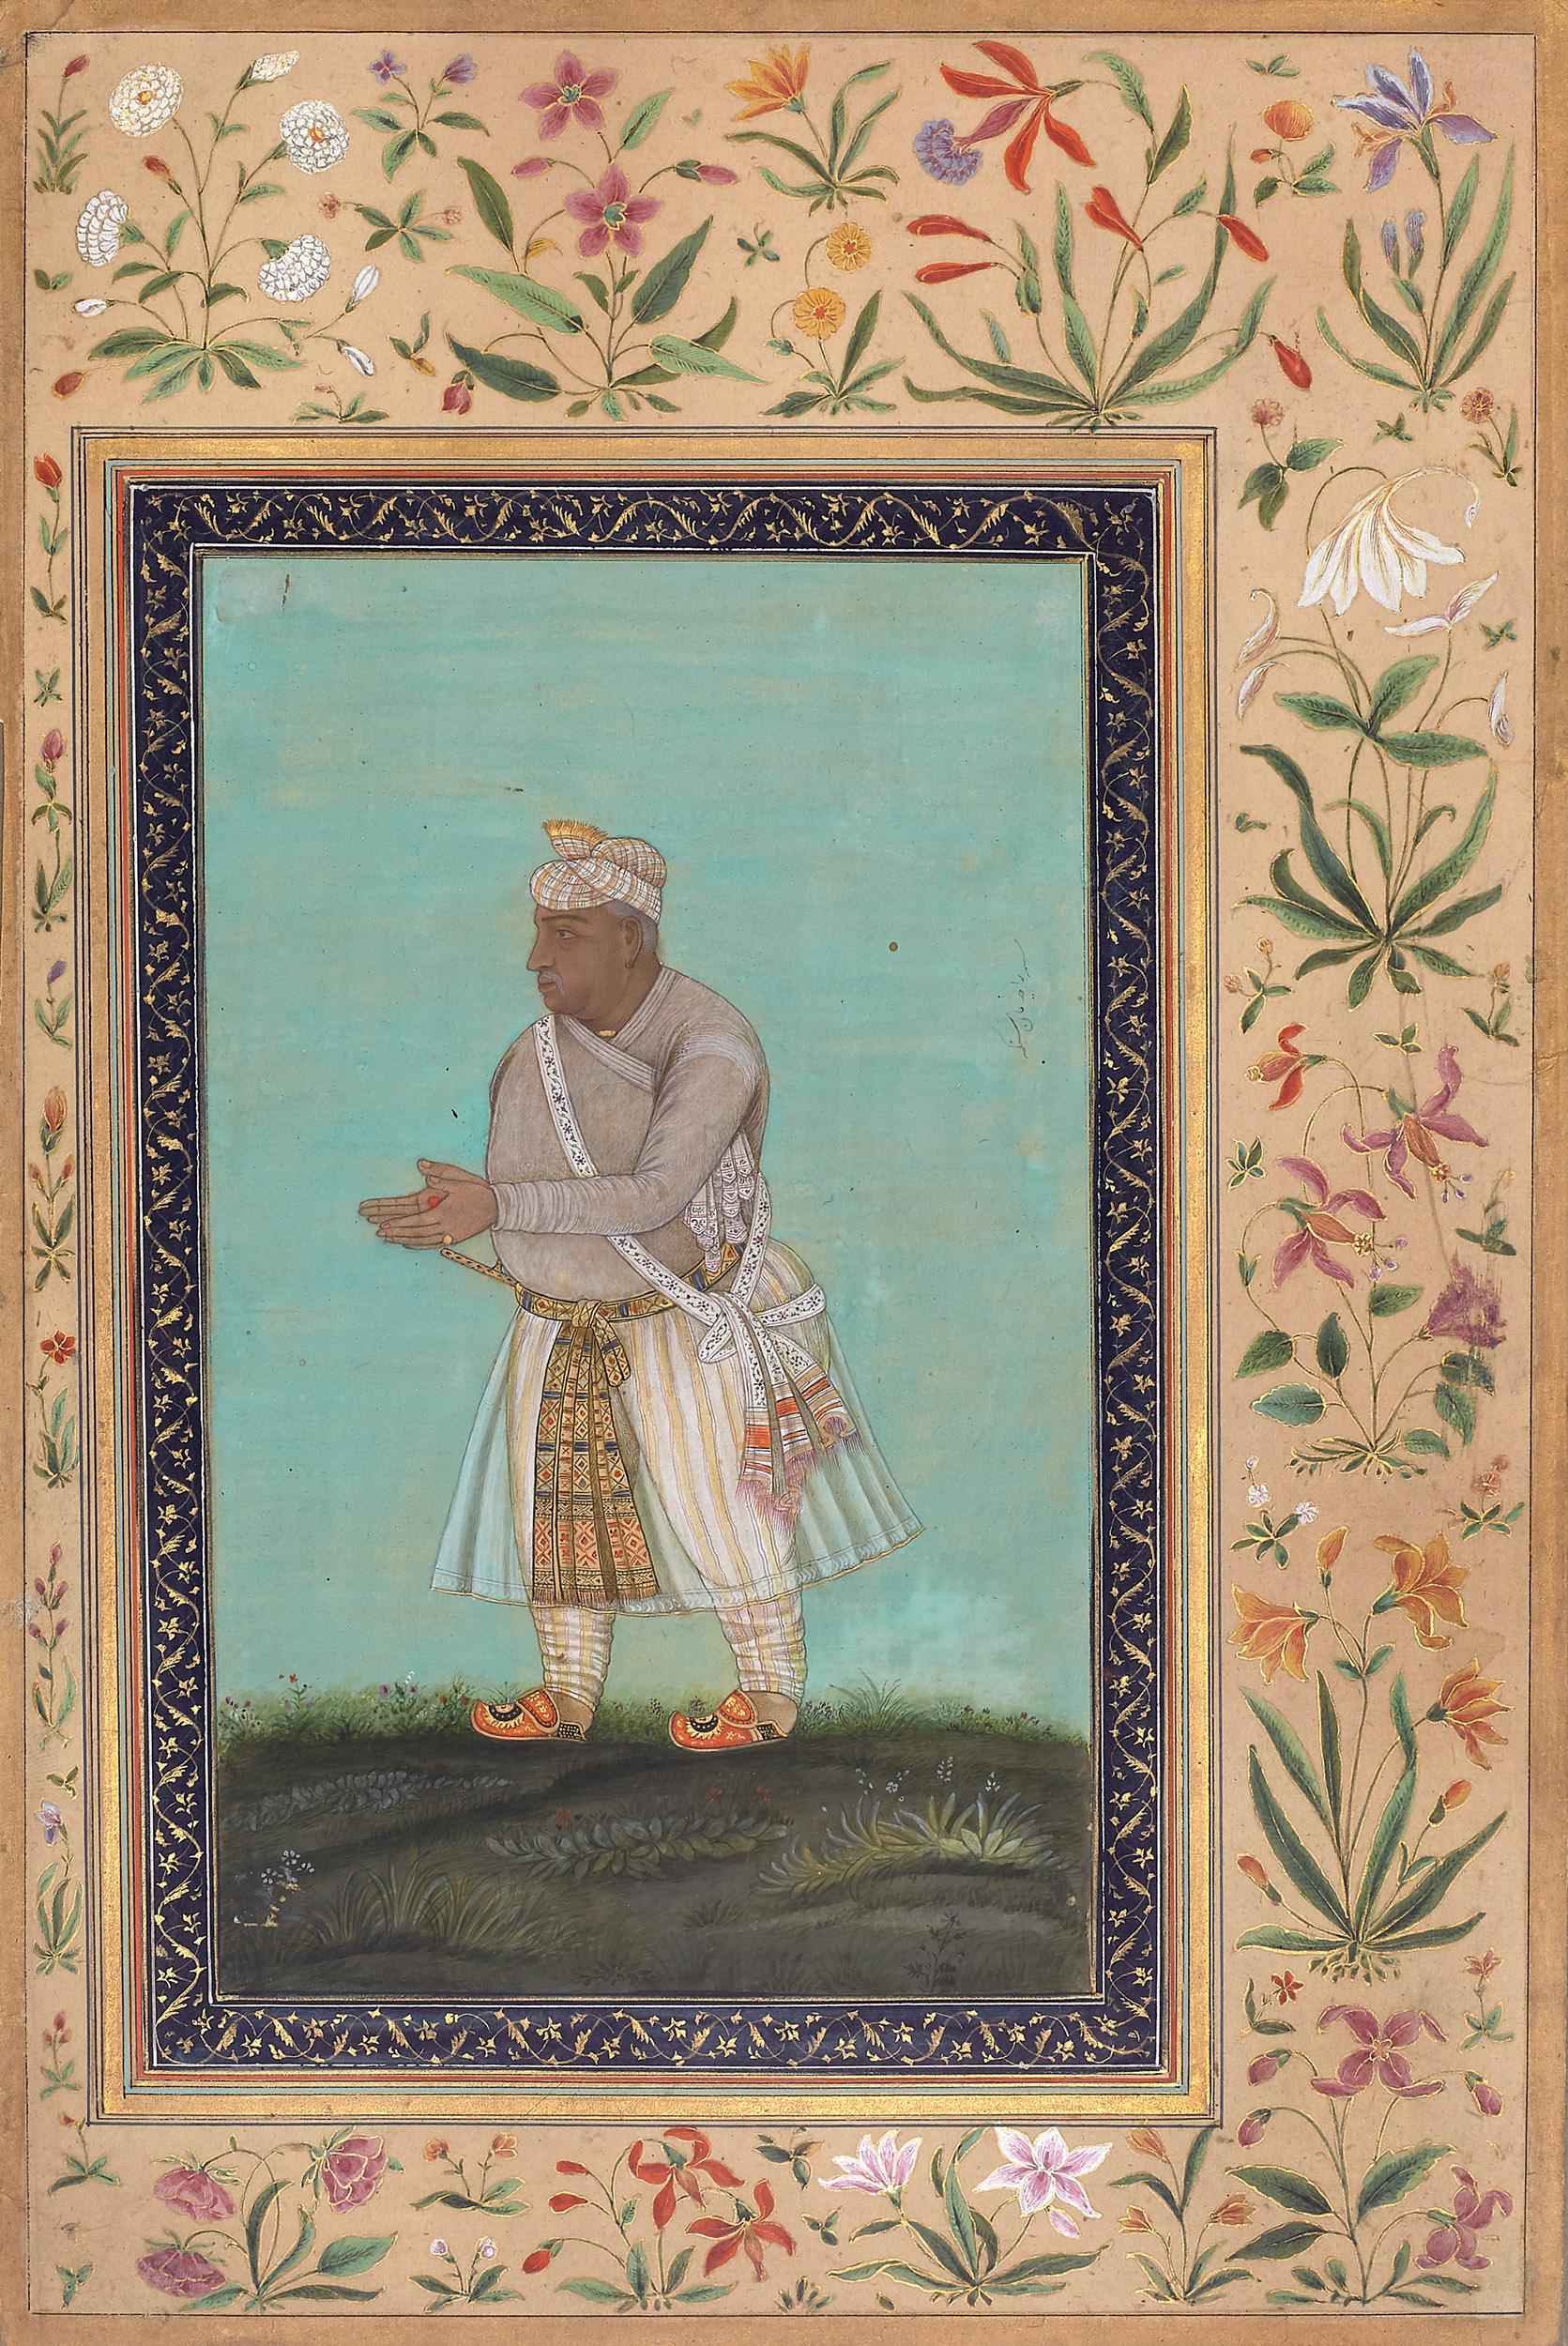 Raja Man Singh I